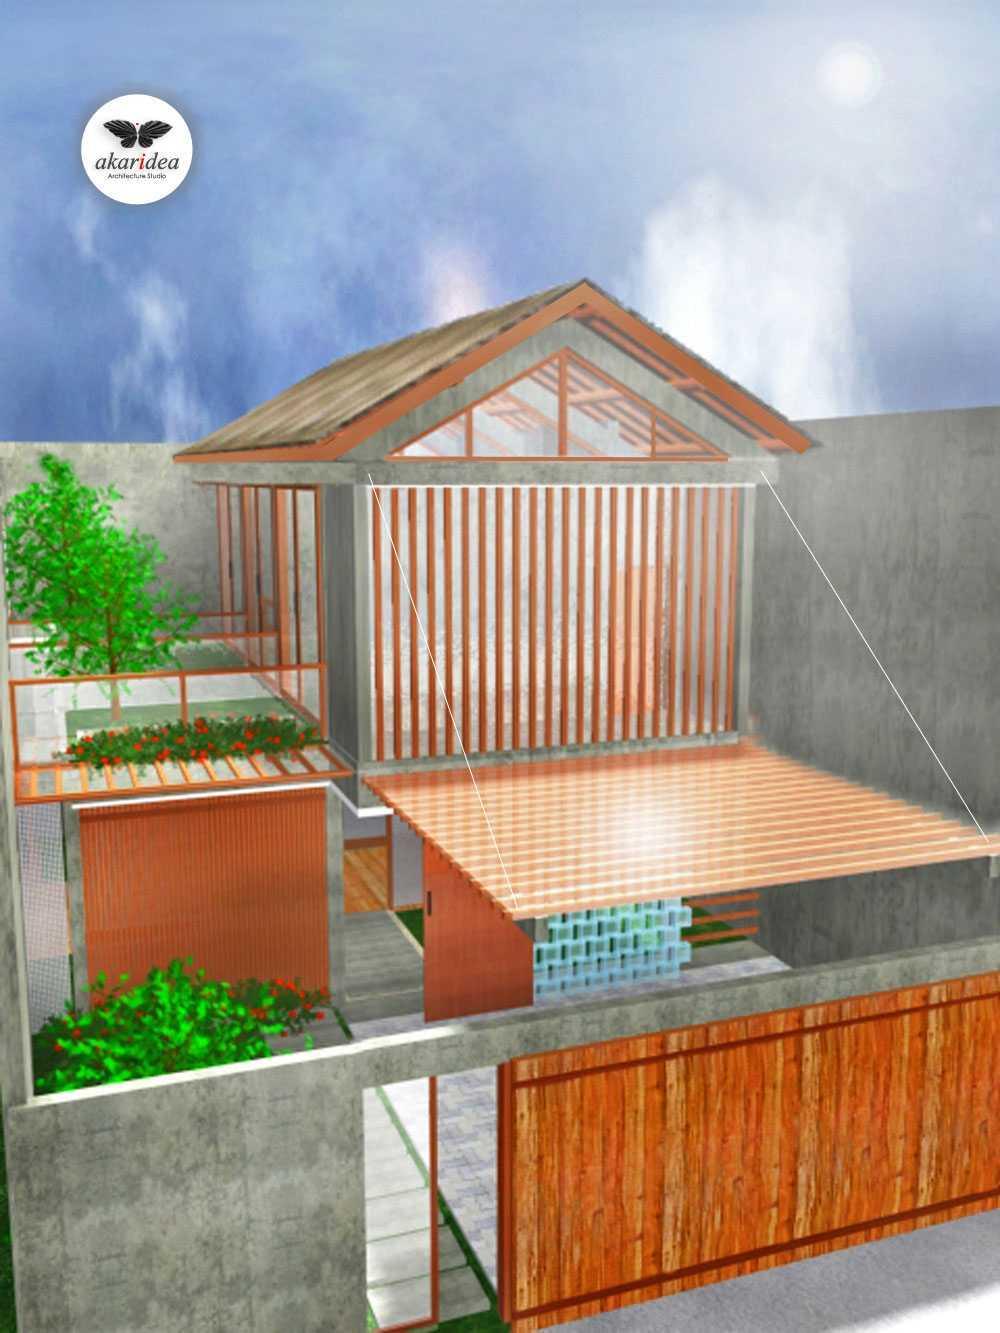 Antoni Winata Satria House Daan Mogot, Satria, West Jakarta Daan Mogot, Satria, West Jakarta Front Facade Kontemporer,tropis,wood,modern 23144